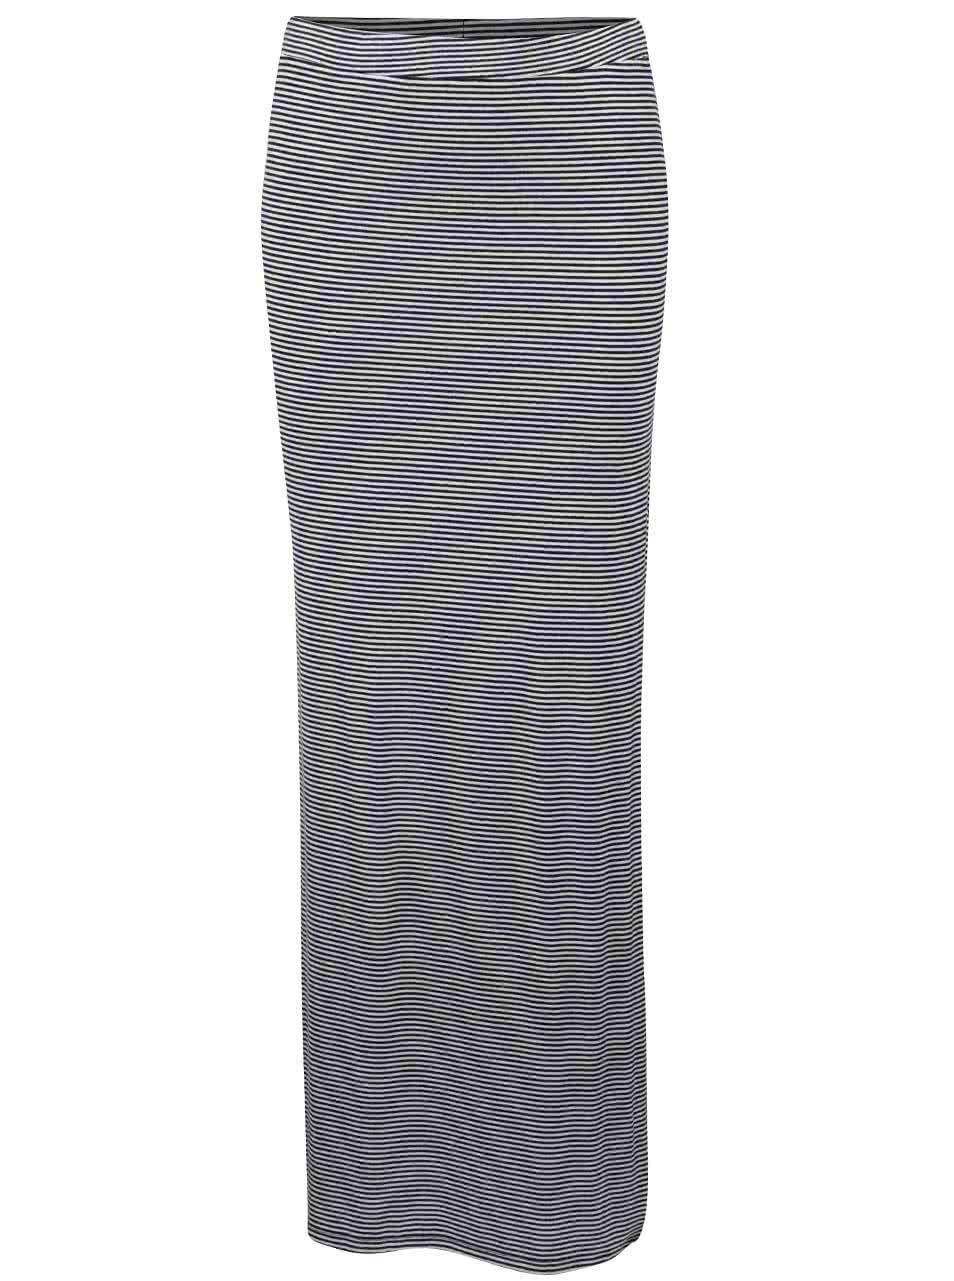 ce6088158b34 Čierno-biela dlhá sukňa s pruhmi a rozparkami TALLY WEiJL ...